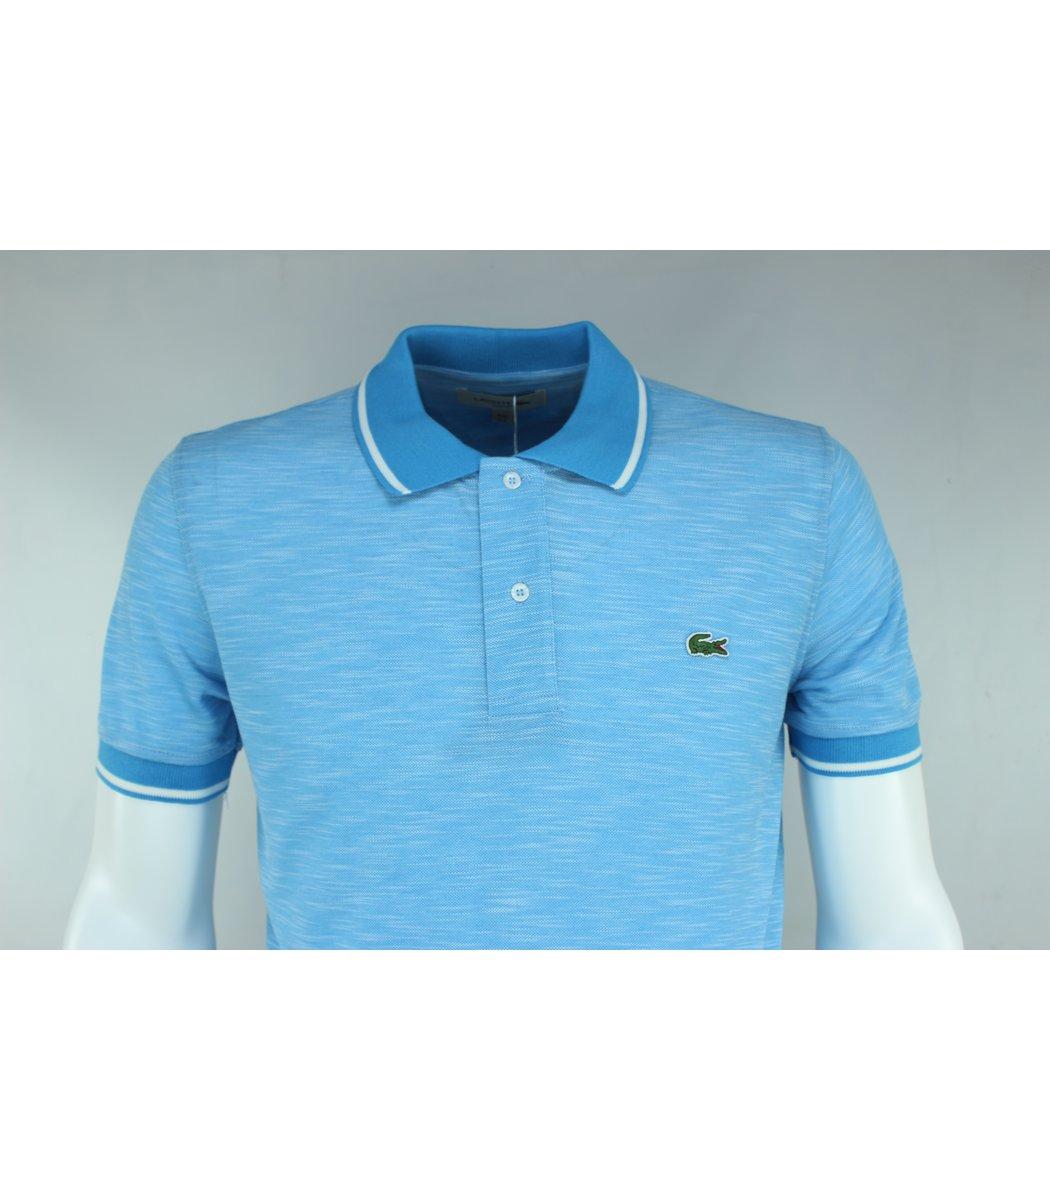 Голубая футболка поло Lacoste L2 -удалить